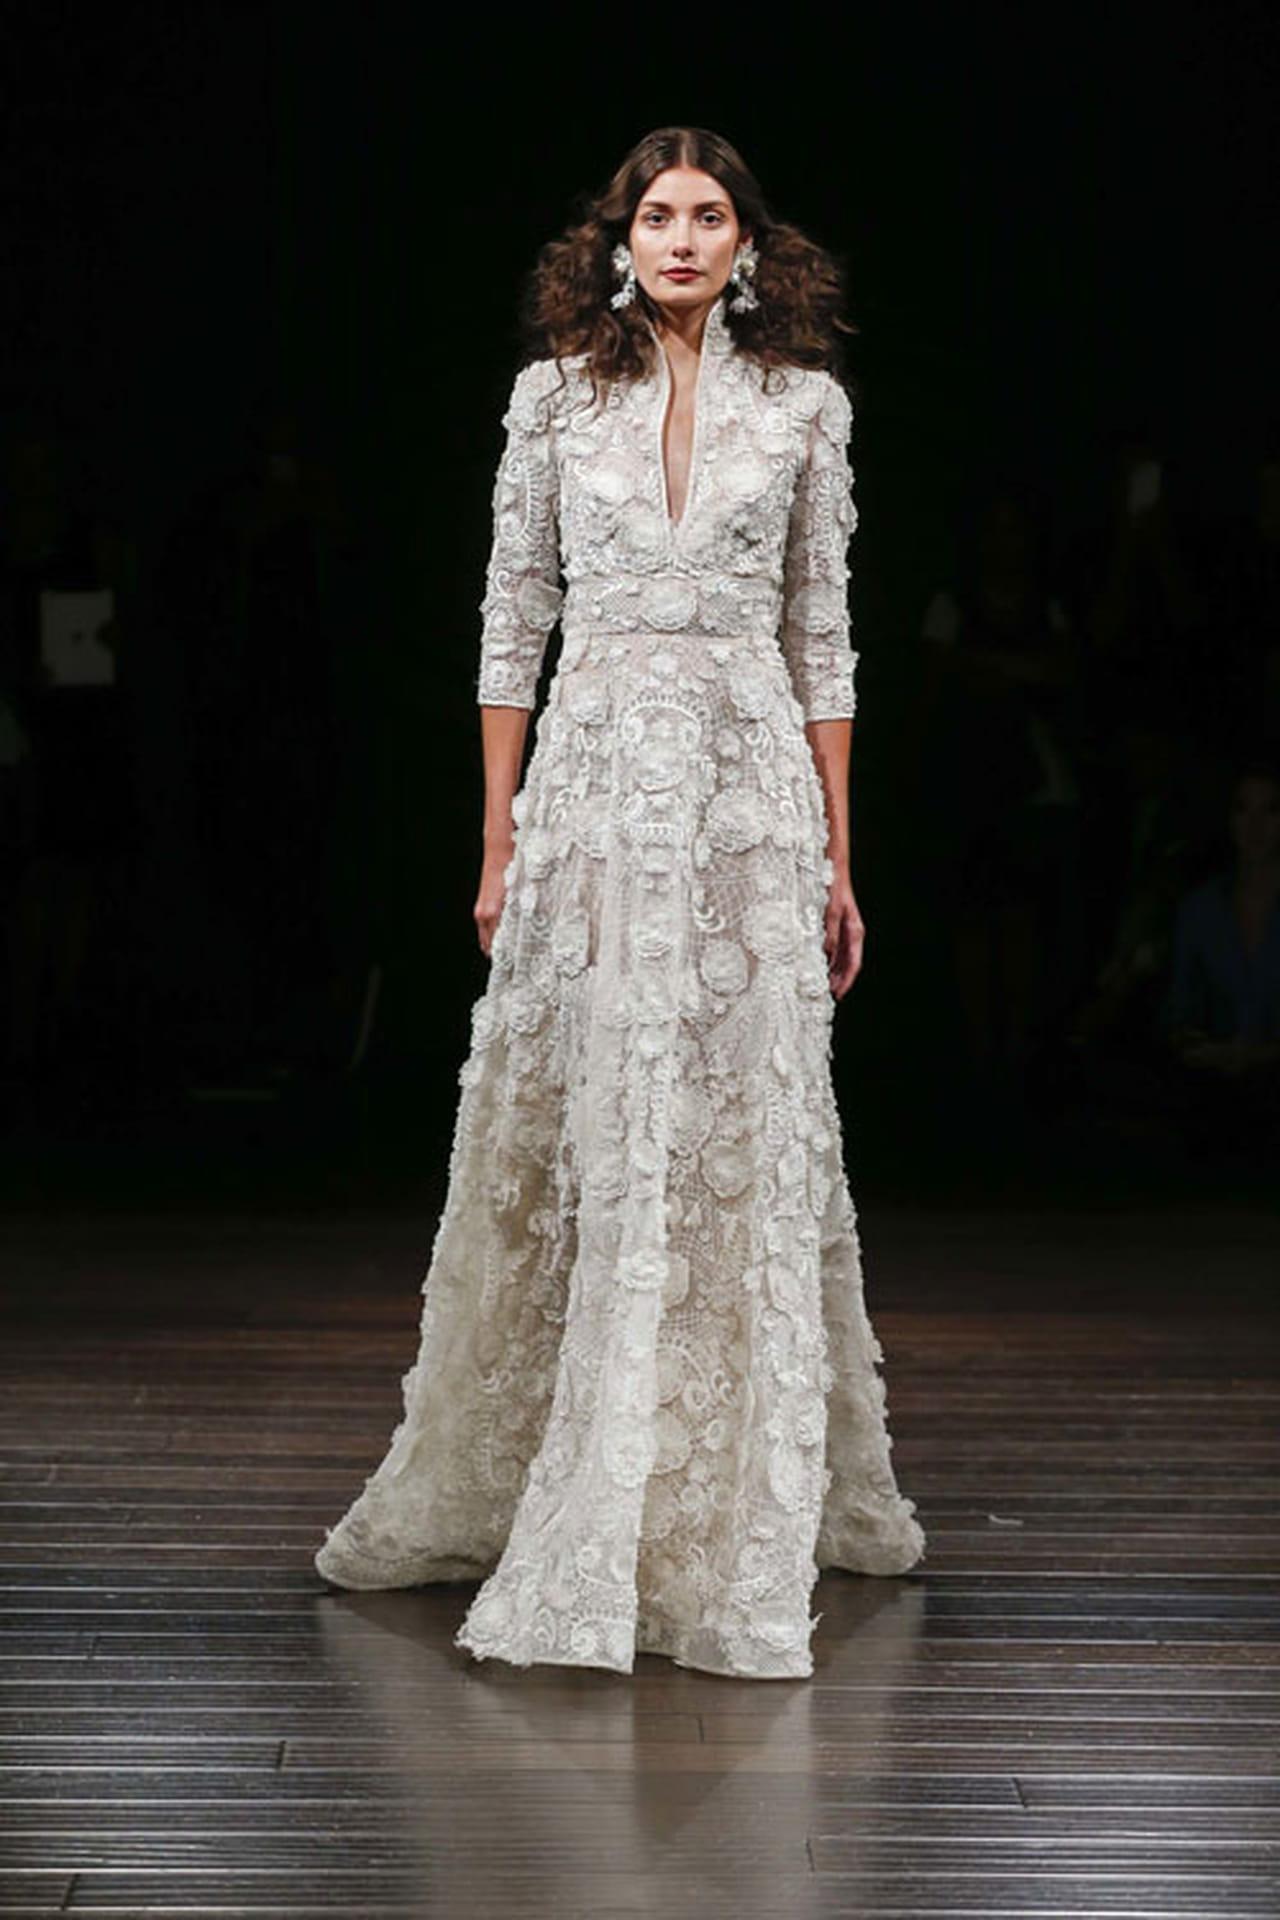 42c55ee1b فستان زفاف بأكمام دانتيل بتصميم رومانسي من روزا كلارا Rosa Clara.